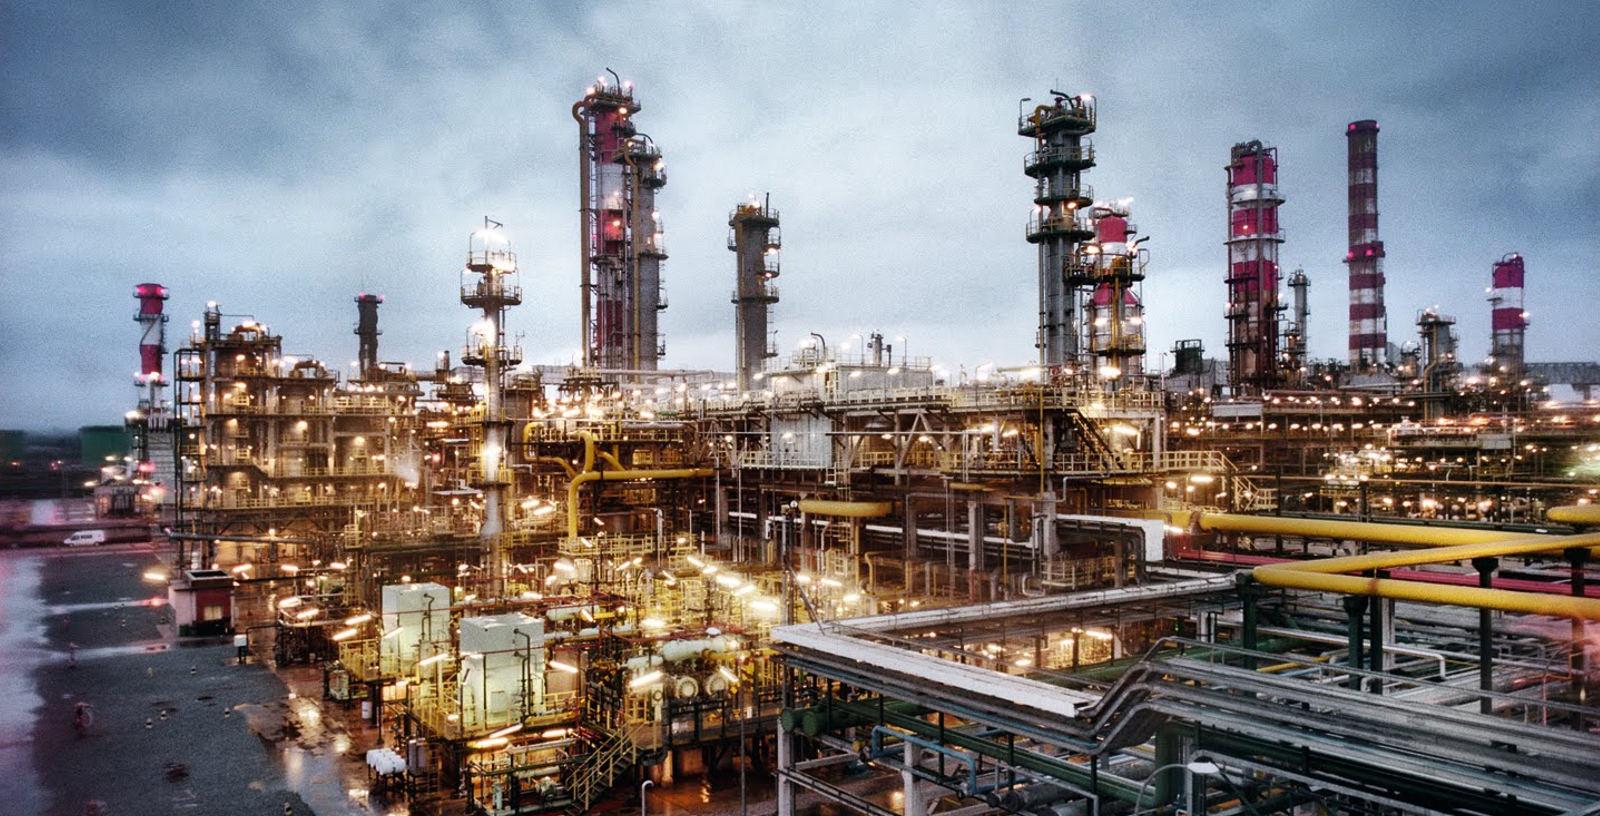 Refinery_Tarragona_Repsol_IDOM_1